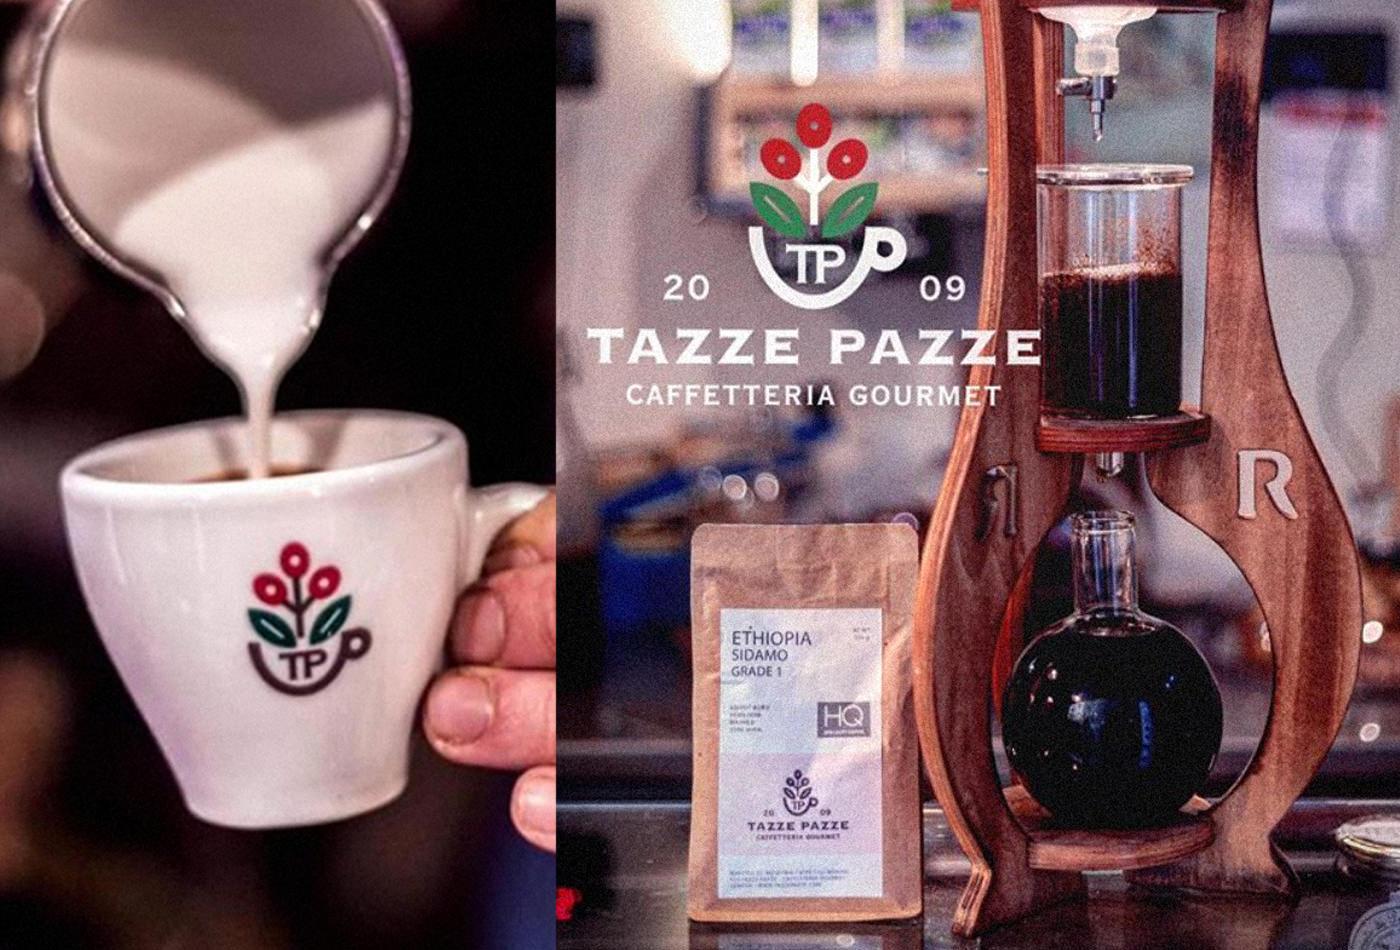 tazzepazze-genova-caffe-coffee-specialtycoffee-tazze-5lampadi-branding-vacaliebres